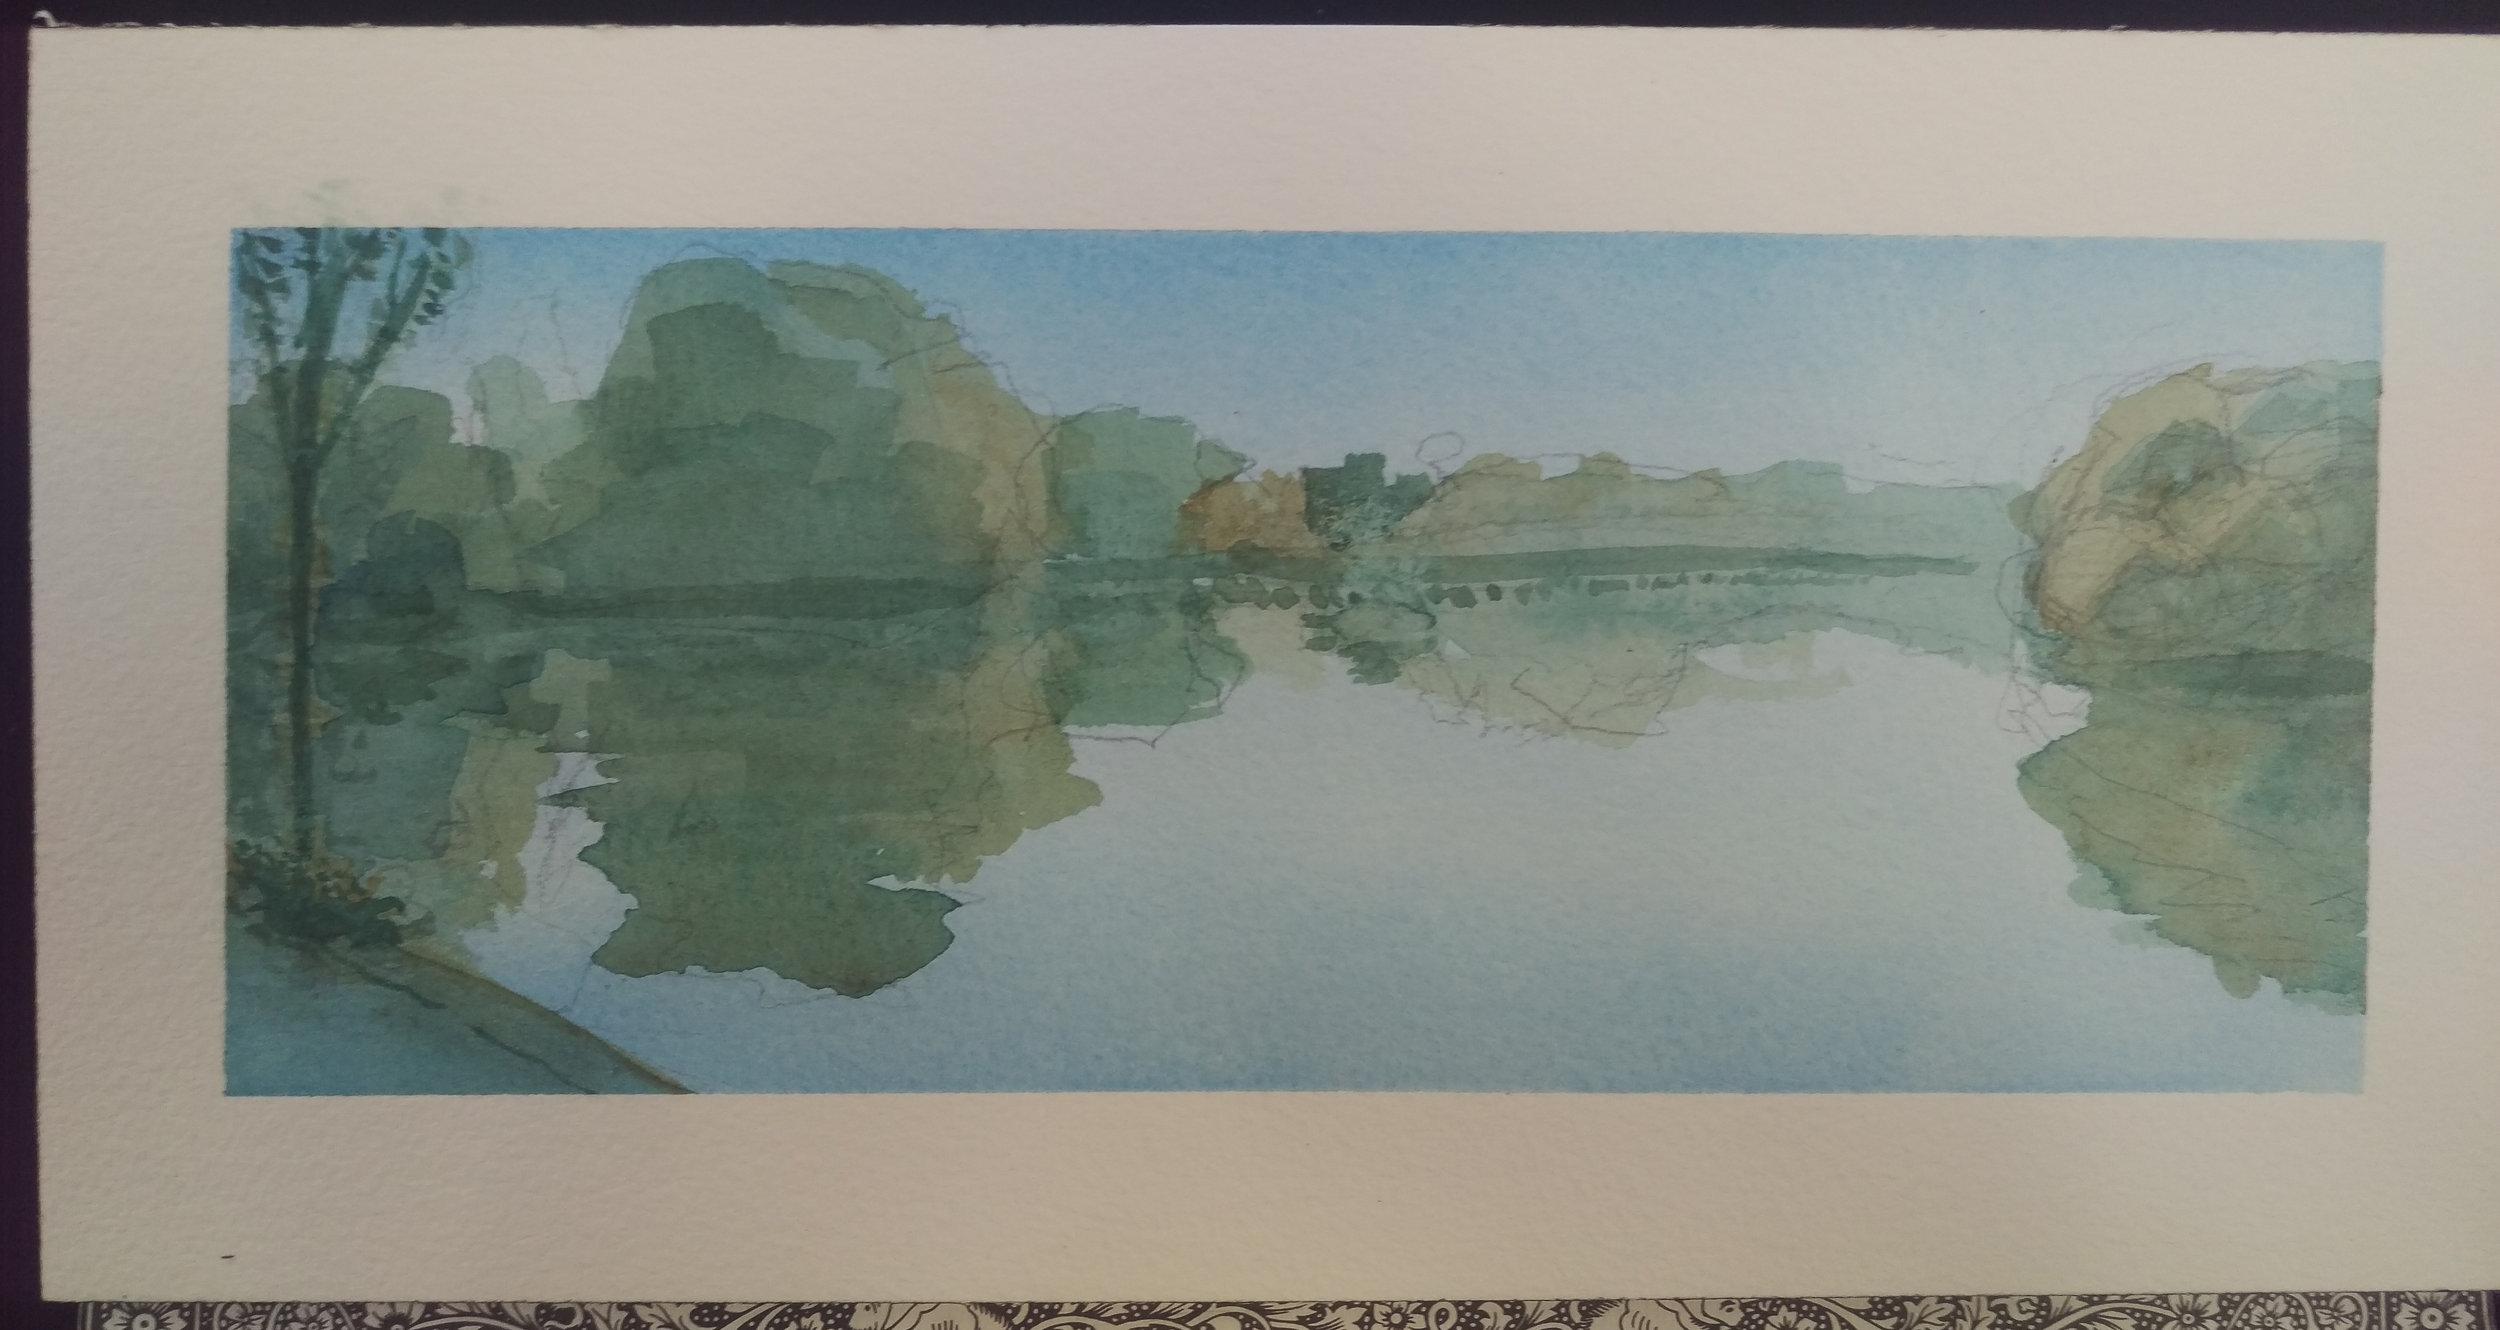 Hackensack in Quiet Air - Watercolor on paper